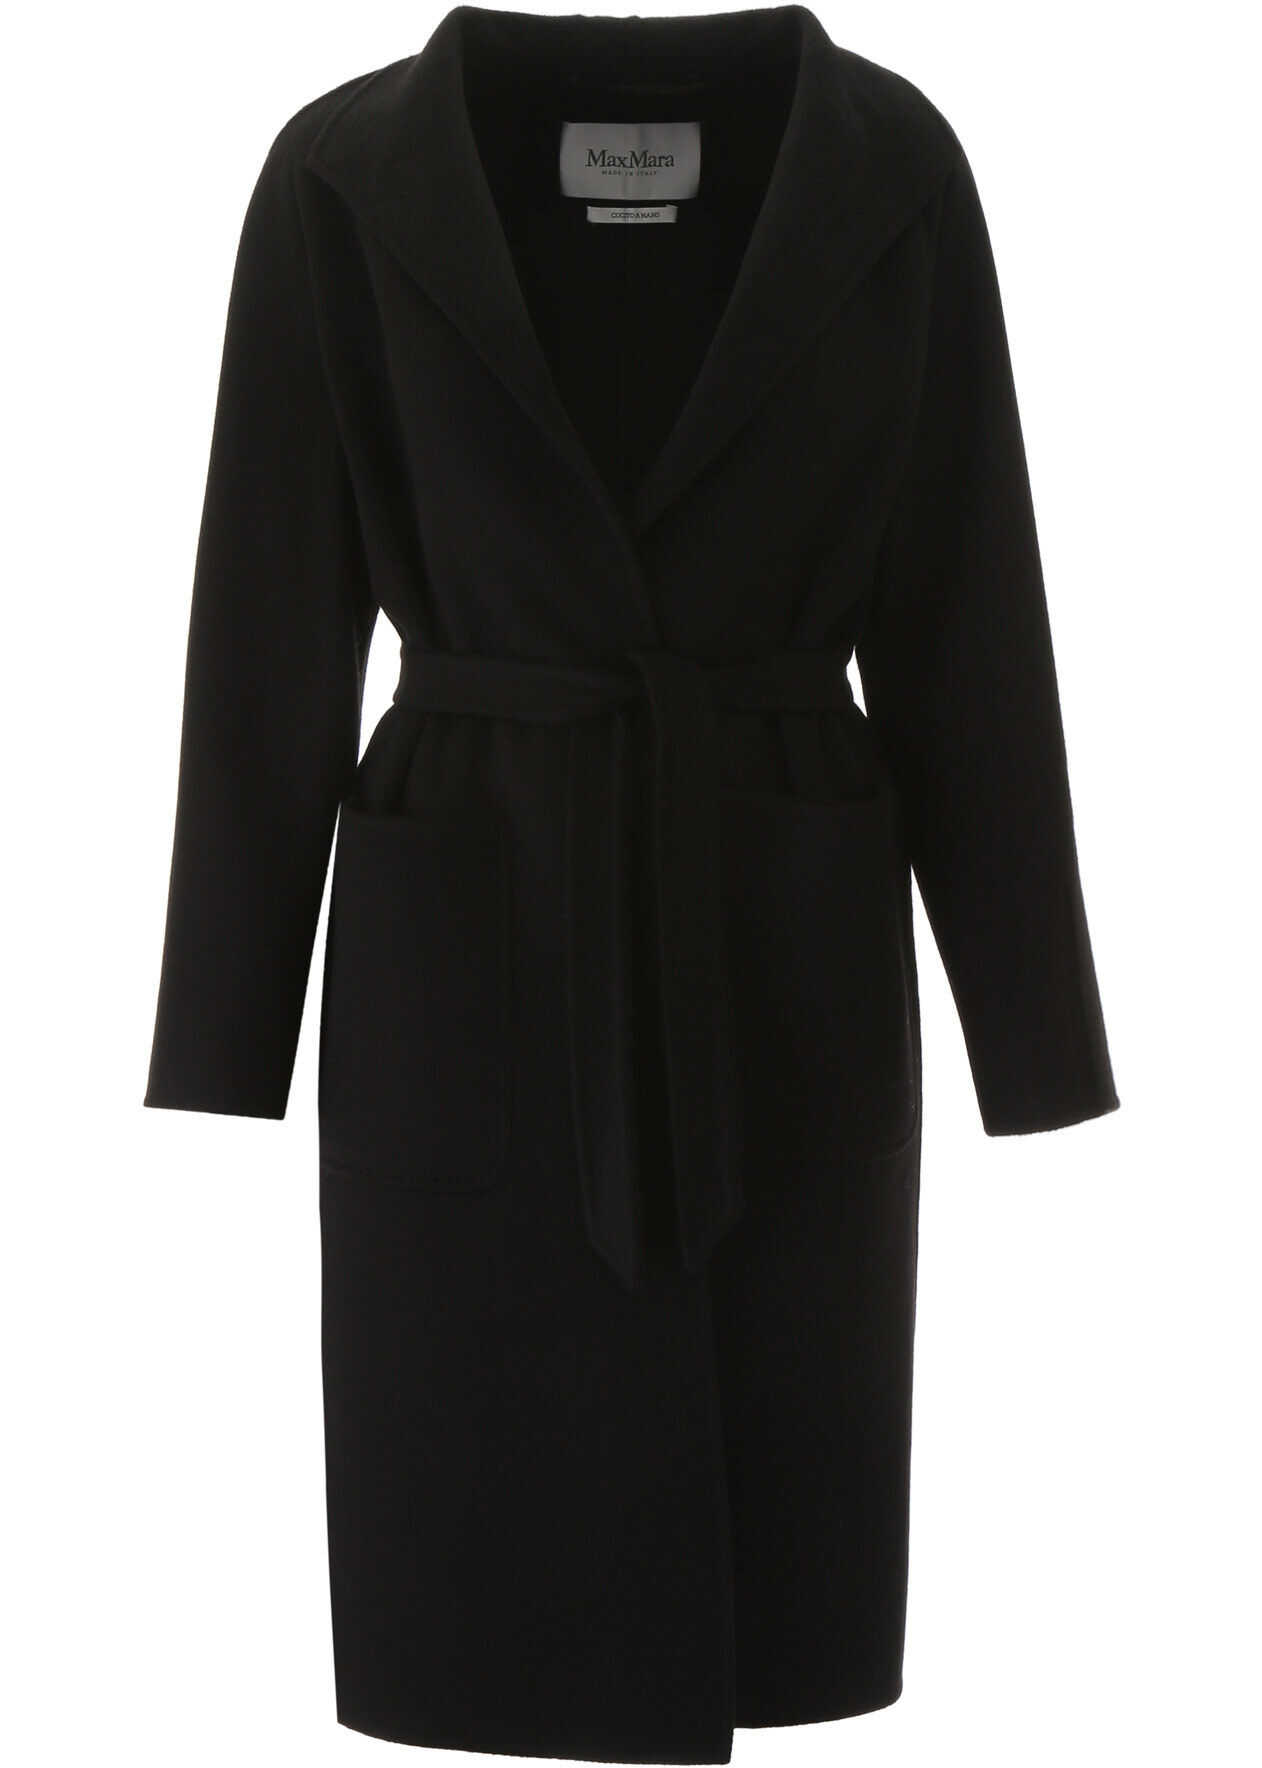 Max Mara Cashmere Coat NERO